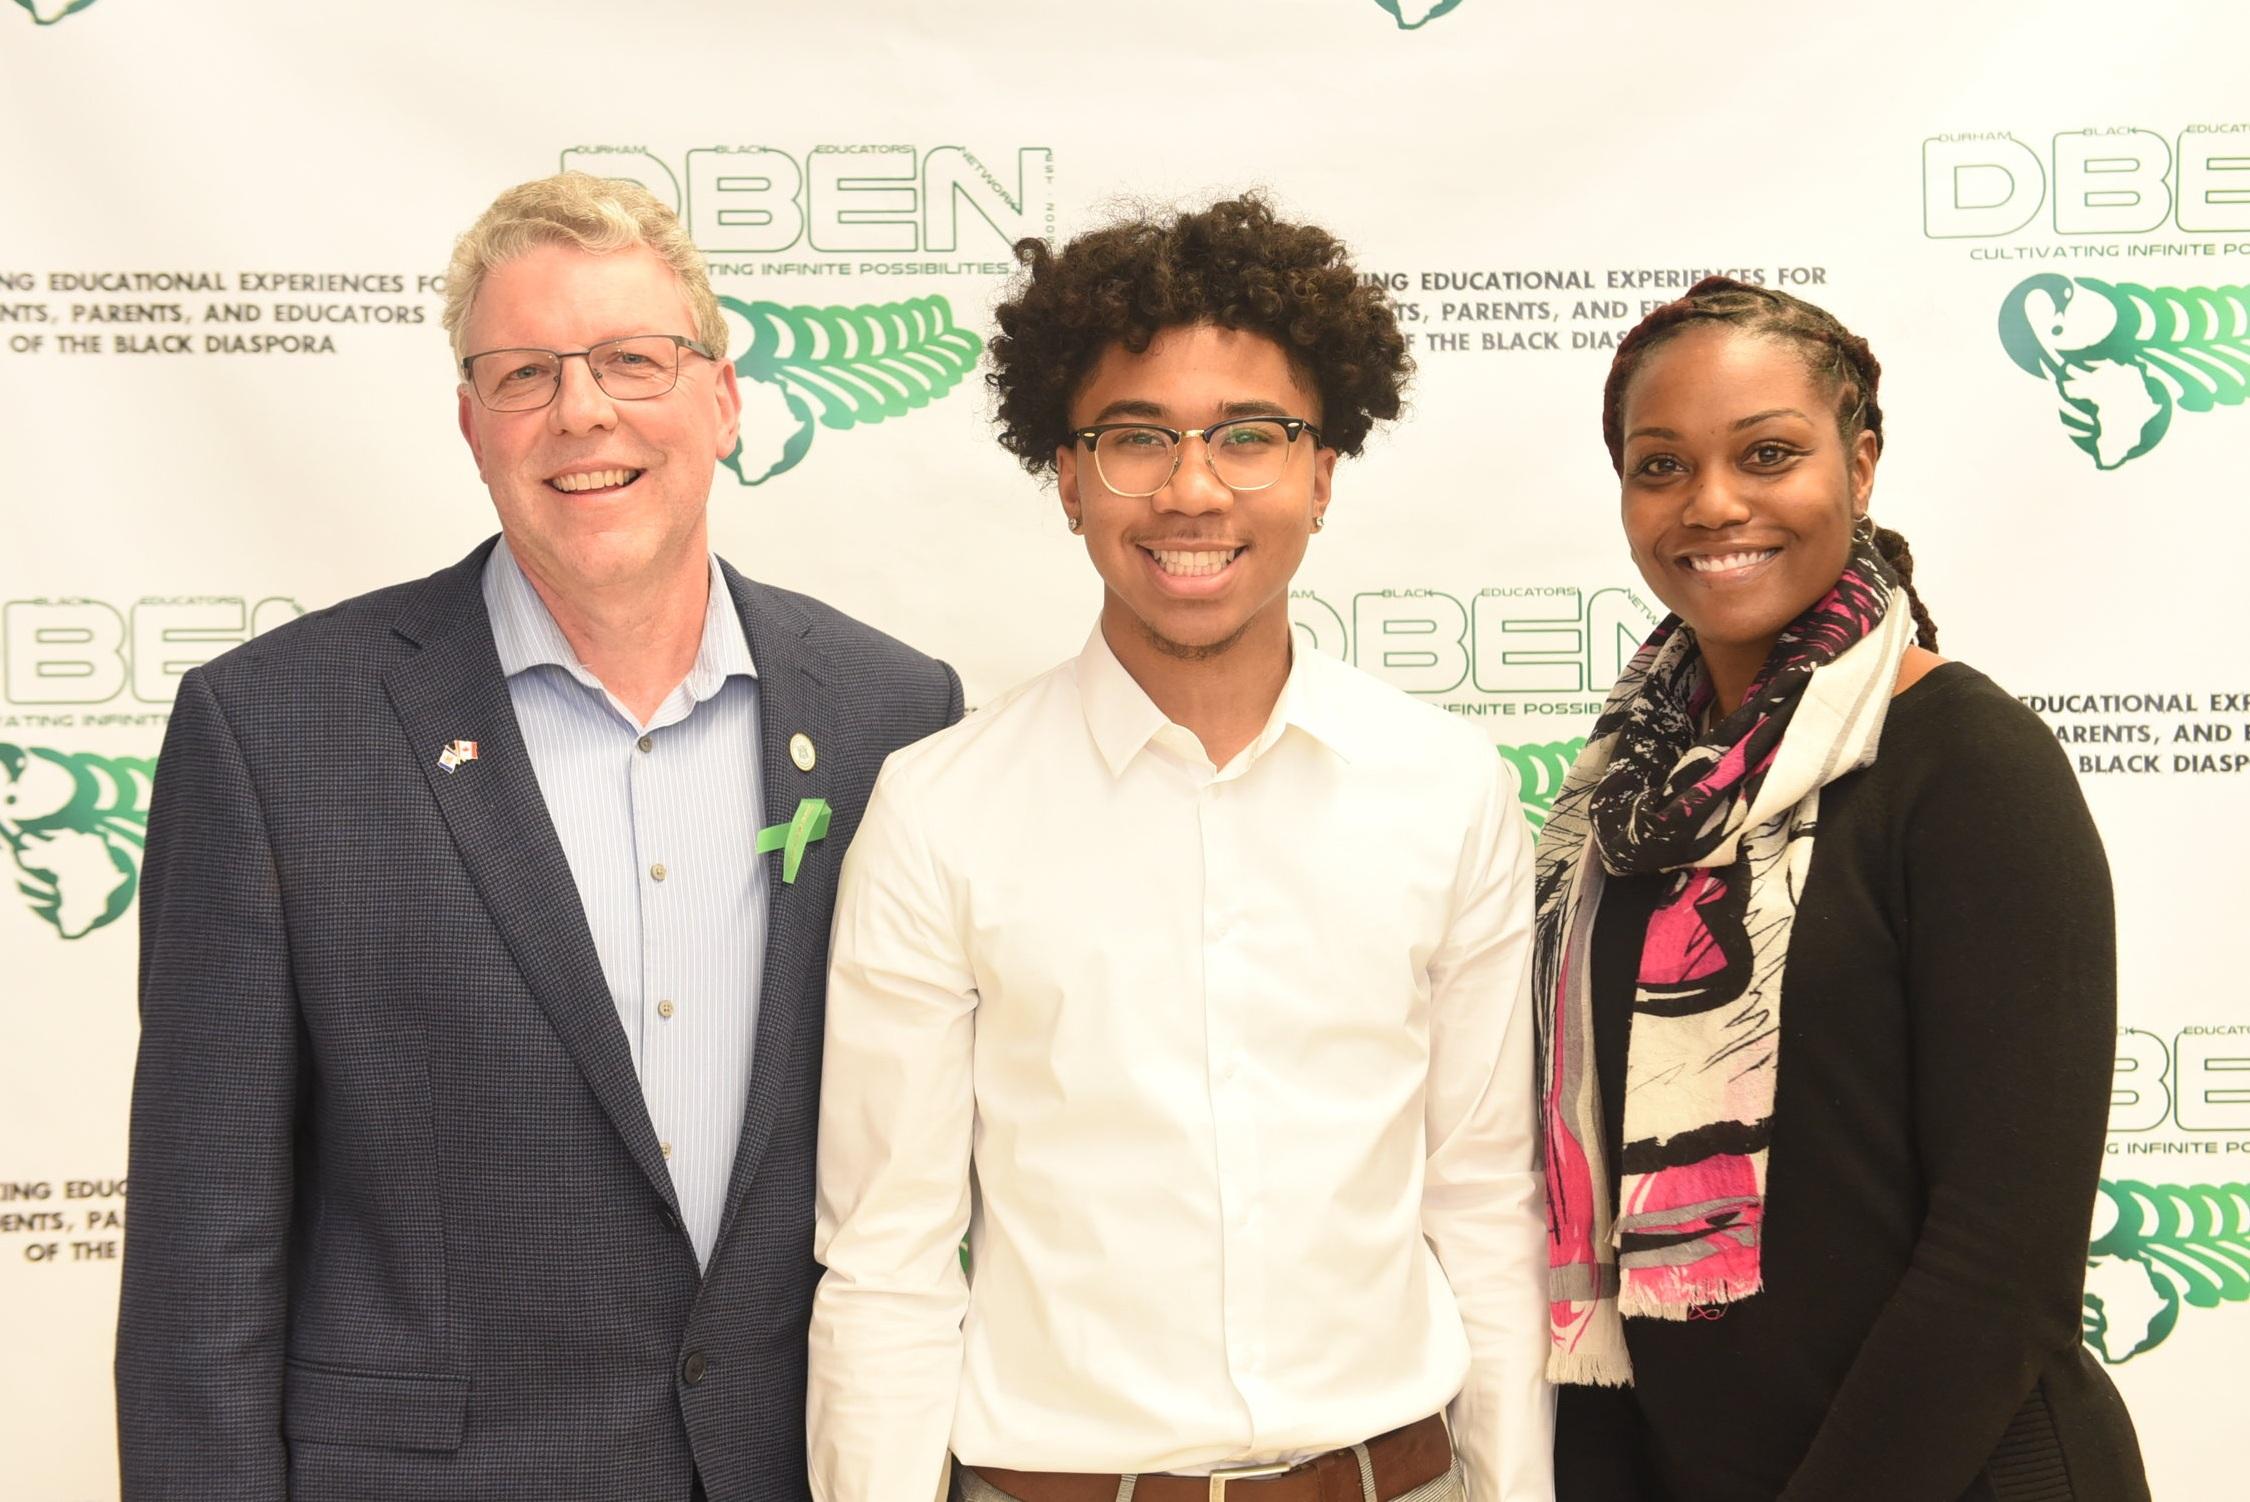 Pickering High School graduate Matthew Murray with his Principal Randy Tennant and Vice-principal Melissa Hunte